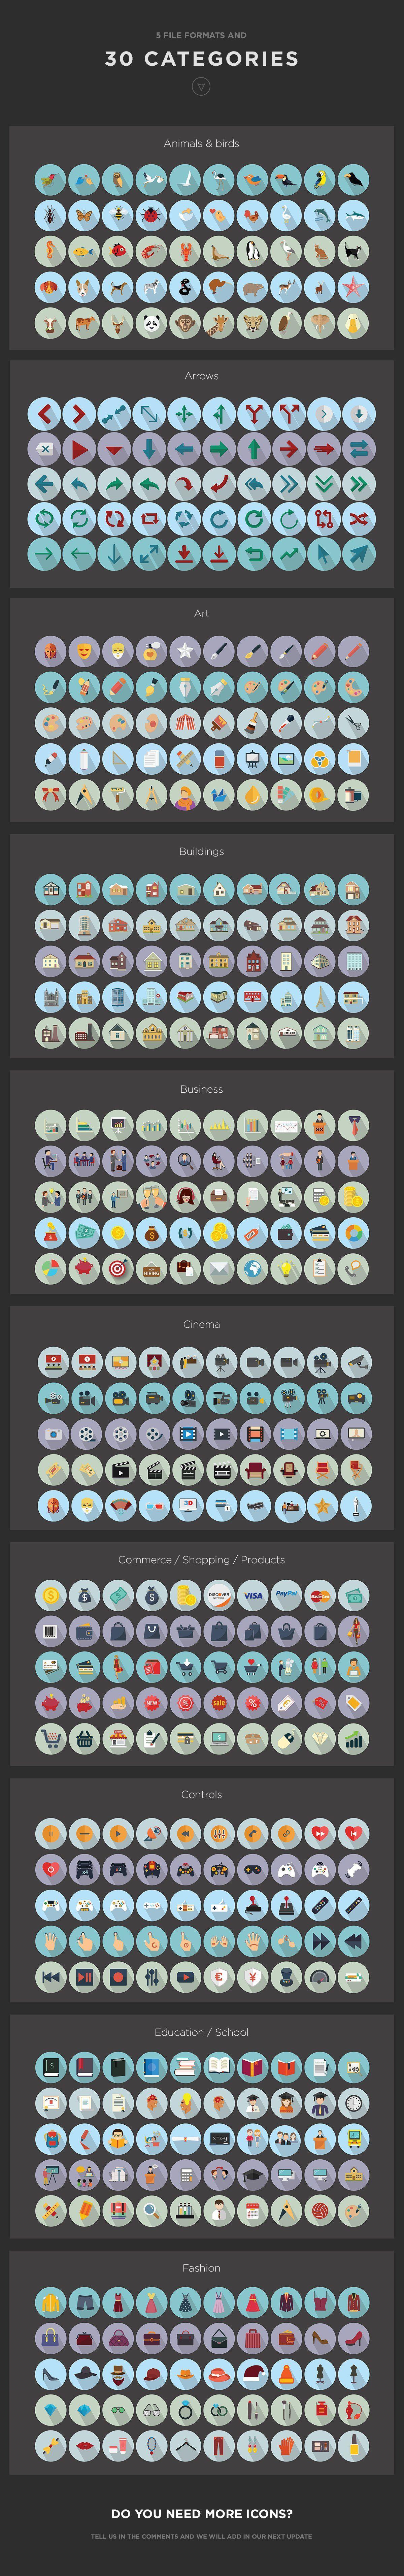 Jumbo Icons Flat Vector Pack by Jumbo Icons on